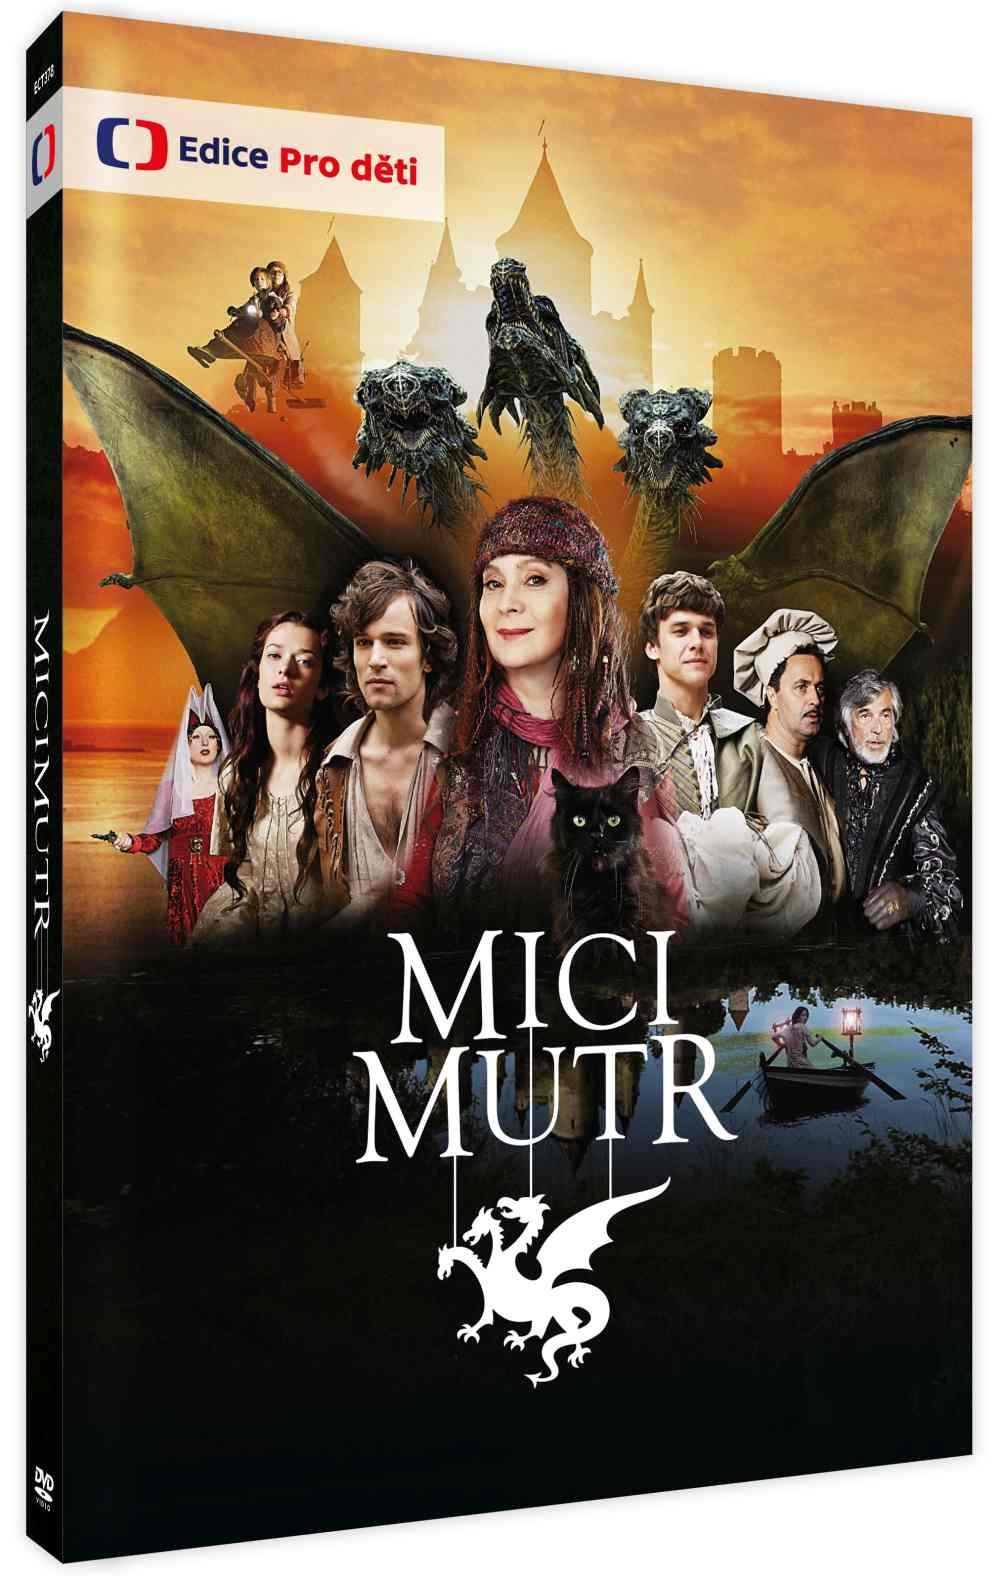 MICIMUTR - DVD